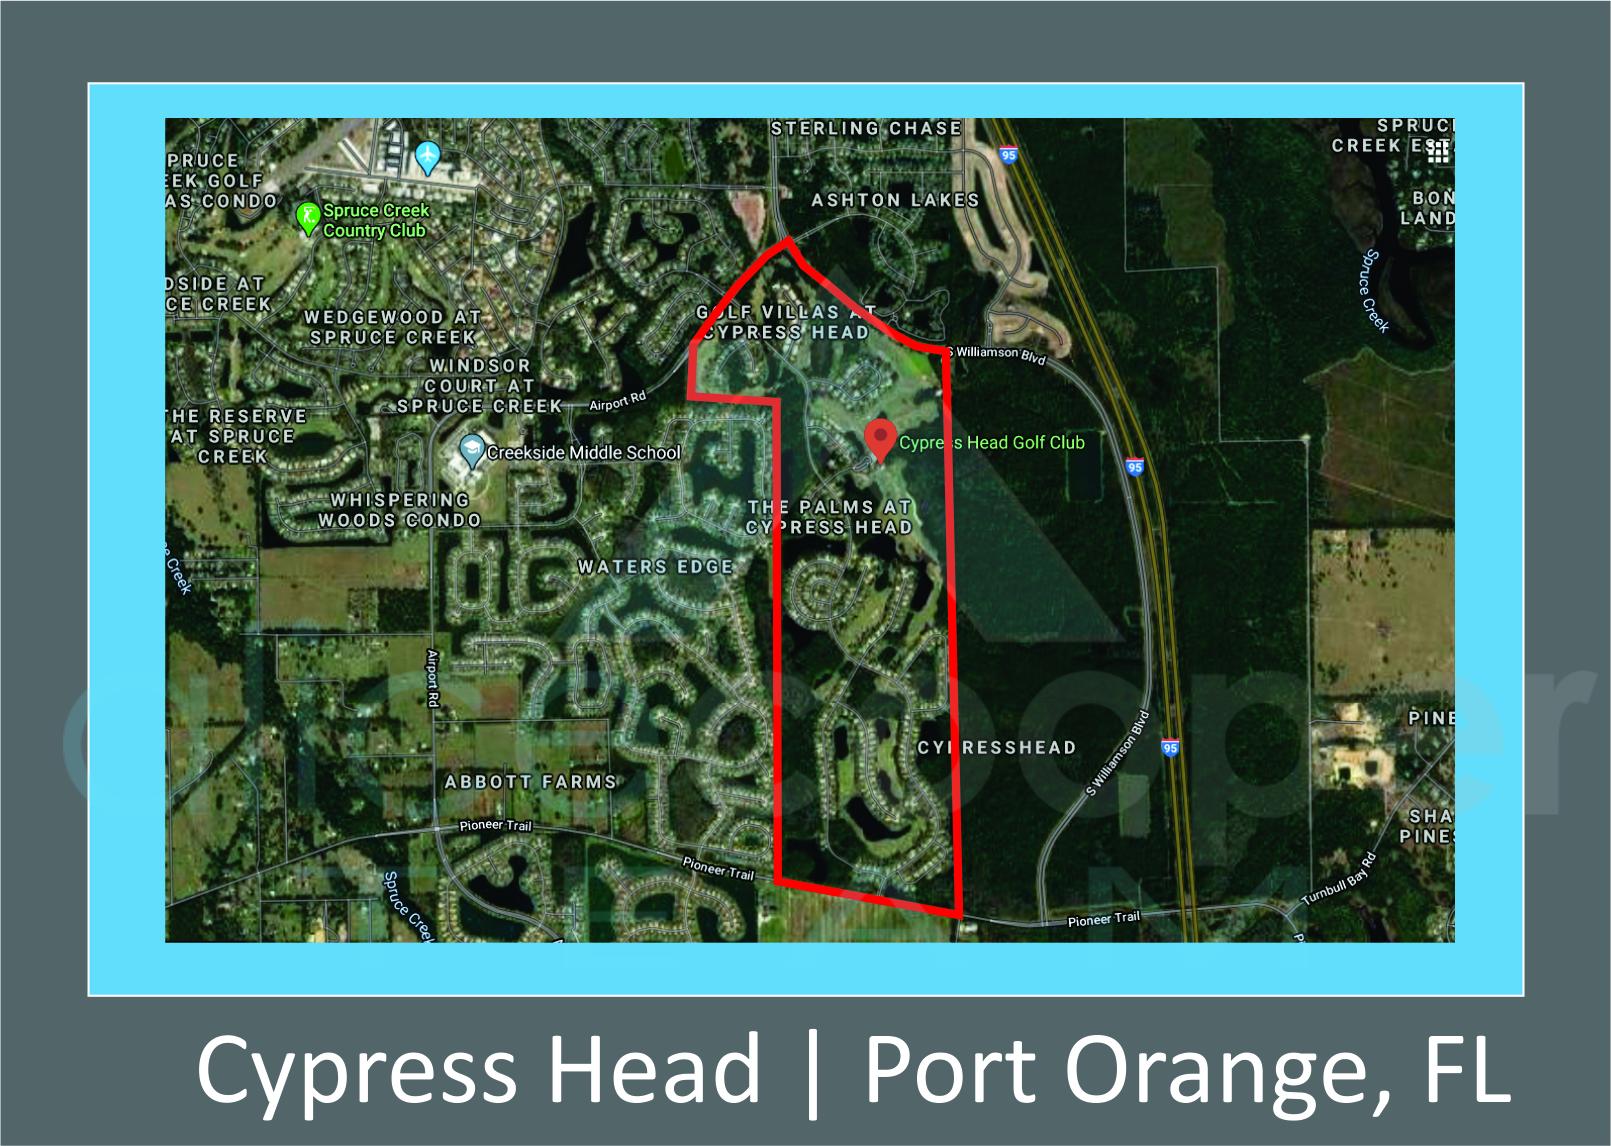 Map of Cypress Head, Port Orange, FL